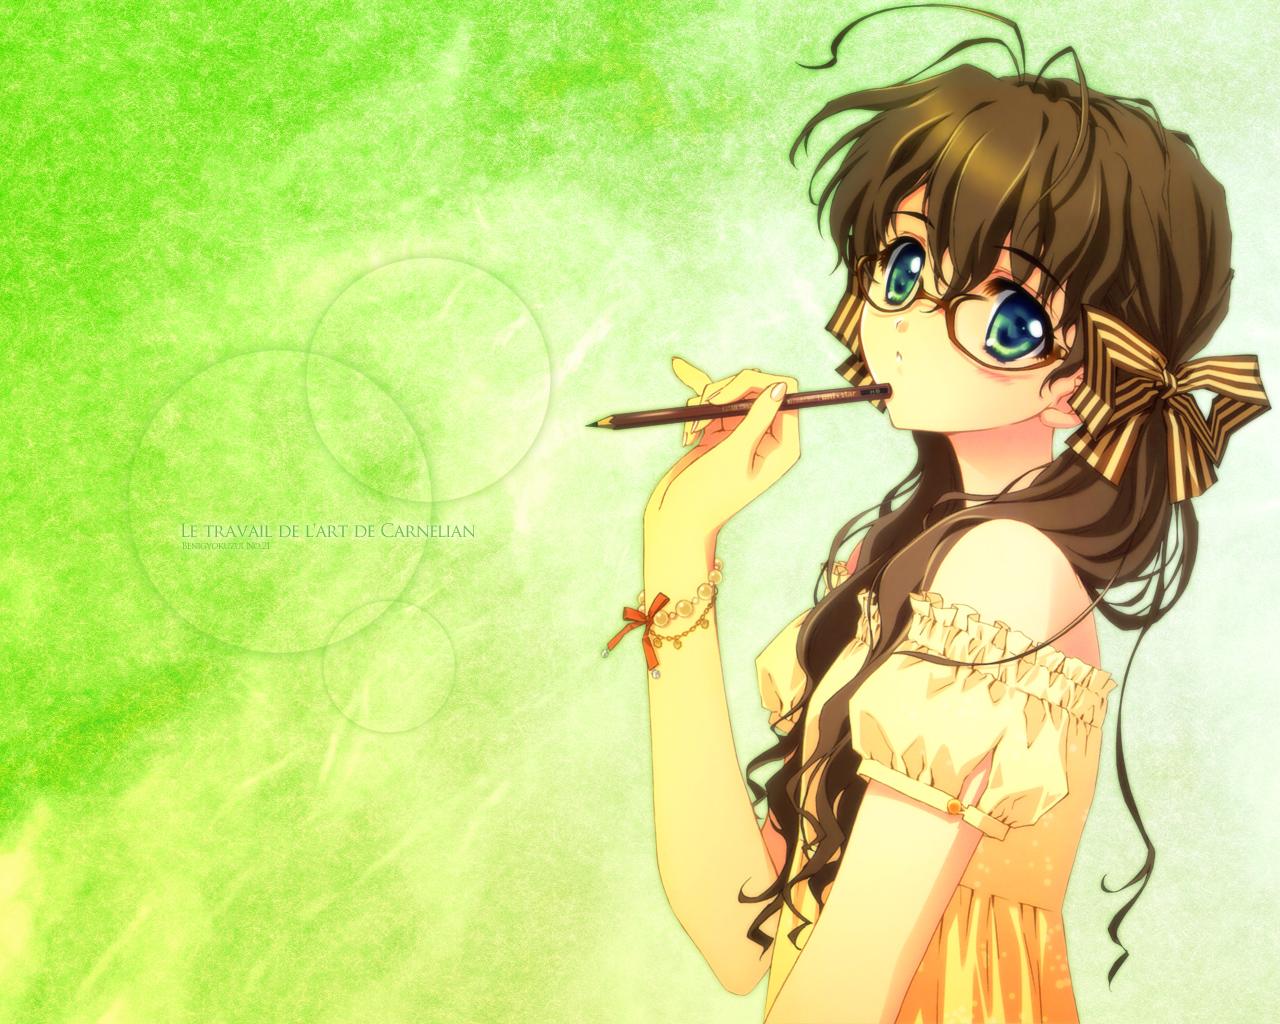 Blue eyes blue eyes brown hair female long hair solo page 37 zerochan anime image board